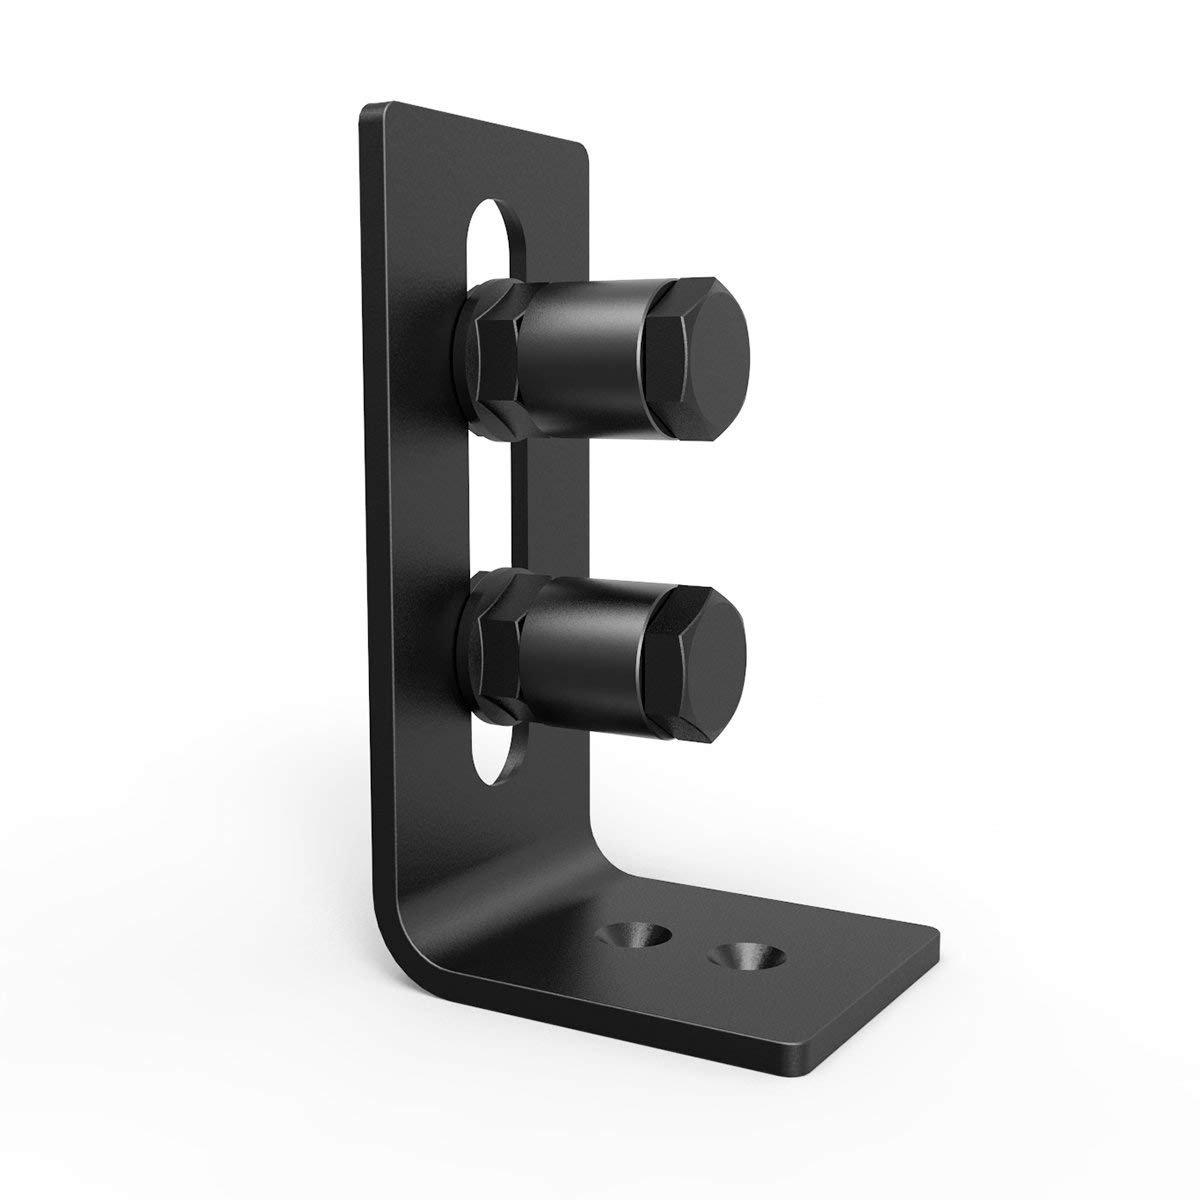 Barn Door Floor Guide Stay Roller - New Designed Stainless Sliding Door Hardware Adjustable Wall Mount Roller Guides for Pocket Door, Cabinets, Sliding Wood Doors (Black) by HOMEWINS (Image #3)